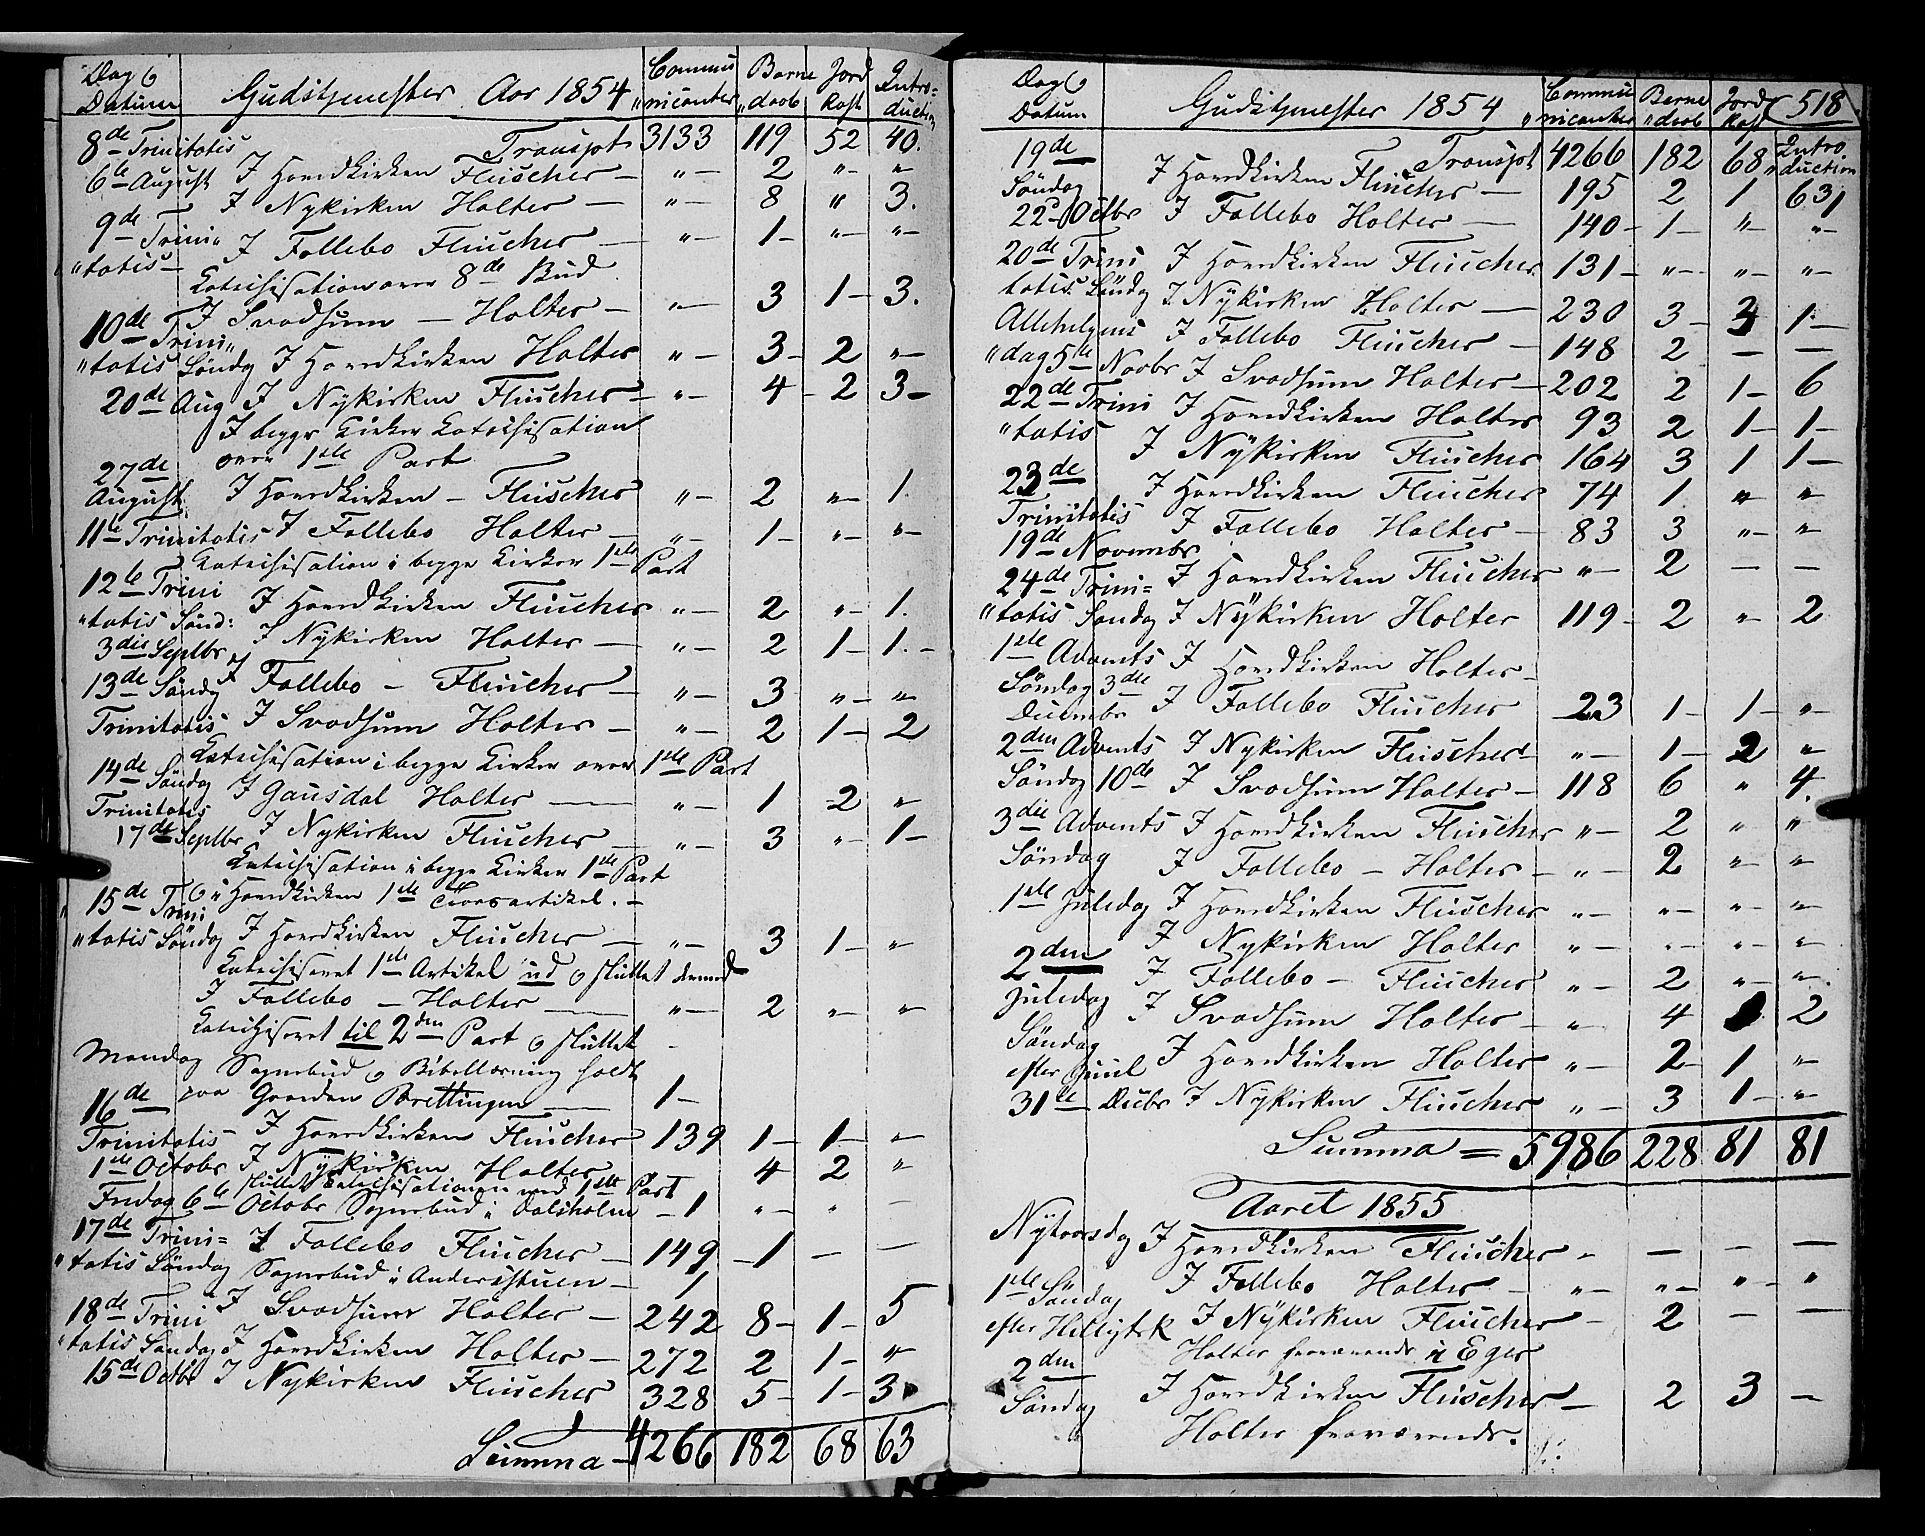 SAH, Gausdal prestekontor, Ministerialbok nr. 8, 1850-1861, s. 518